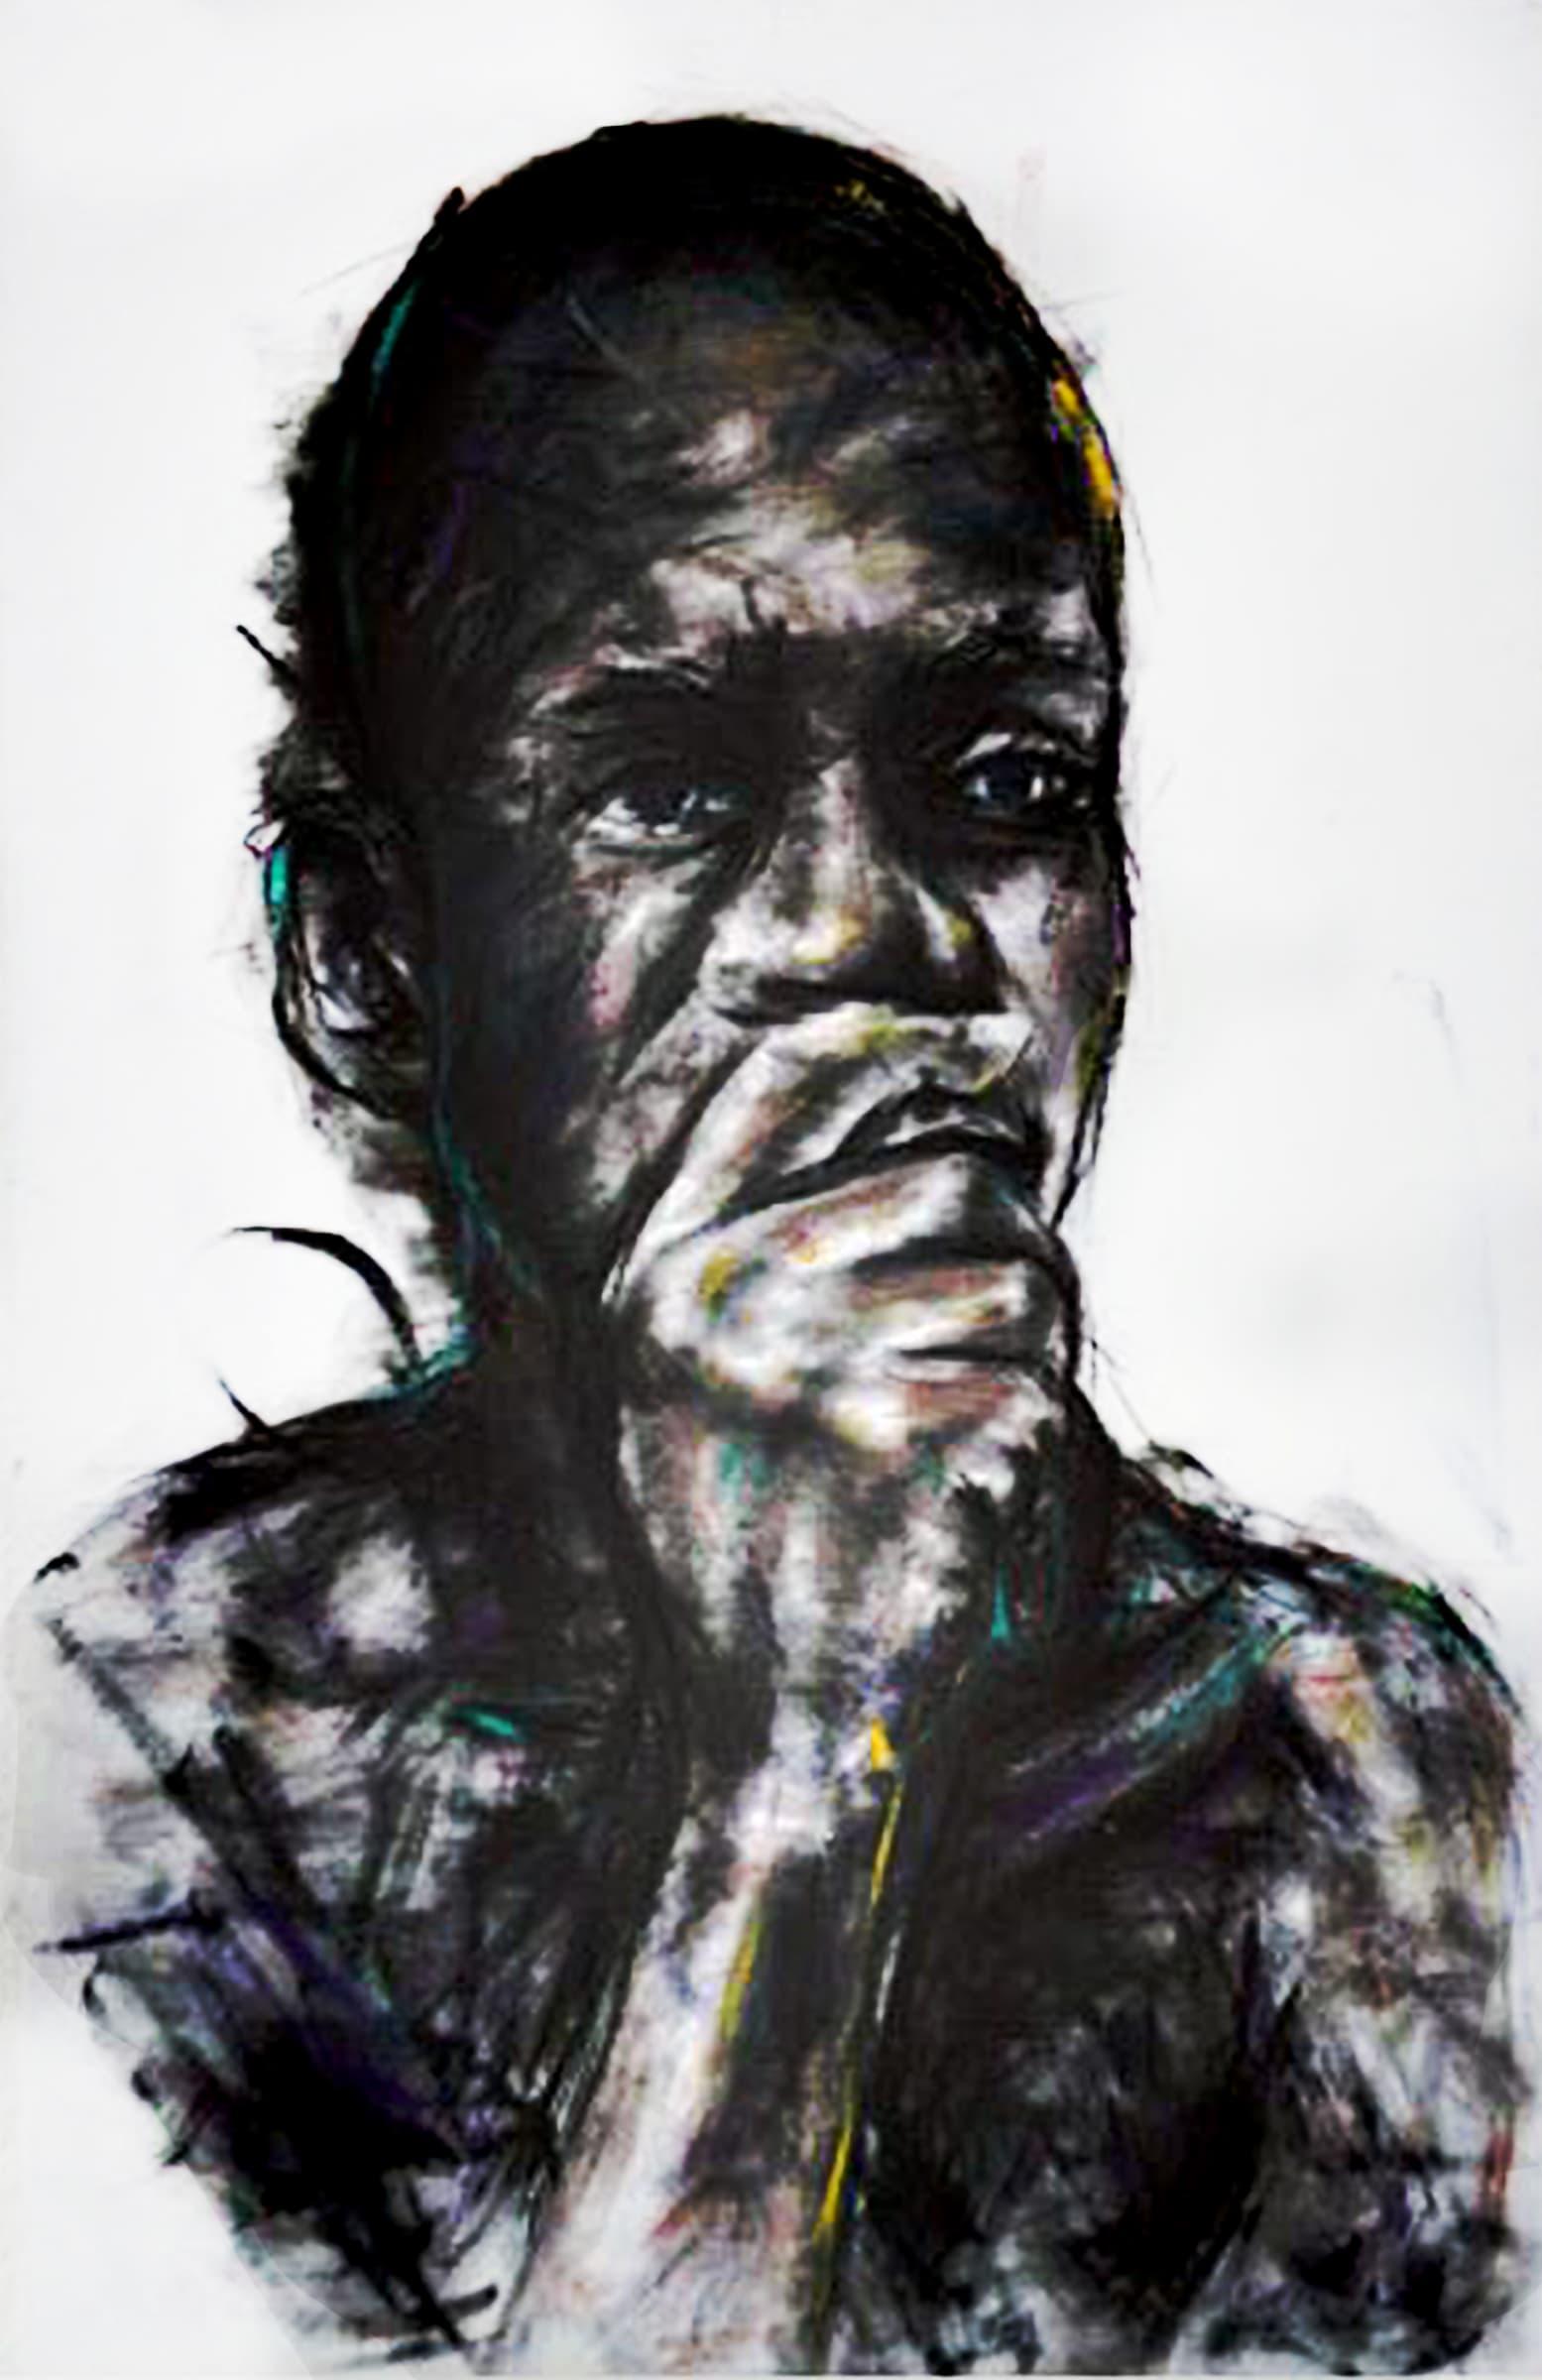 <span class=&#34;link fancybox-details-link&#34;><a href=&#34;/artists/89-mlamuli-mkhwanazi/works/1445-mlamuli-mkhwanazi-loud-then-words-man-2015/&#34;>View Detail Page</a></span><div class=&#34;artist&#34;><strong>Mlamuli Mkhwanazi</strong></div> <div class=&#34;title&#34;><em>Loud Then Words (Man)</em>, 2015</div> <div class=&#34;medium&#34;>Charcoal & Ink On Paper</div> <div class=&#34;dimensions&#34;>118cm x 80cm</div><div class=&#34;price&#34;>R22,000.00</div>